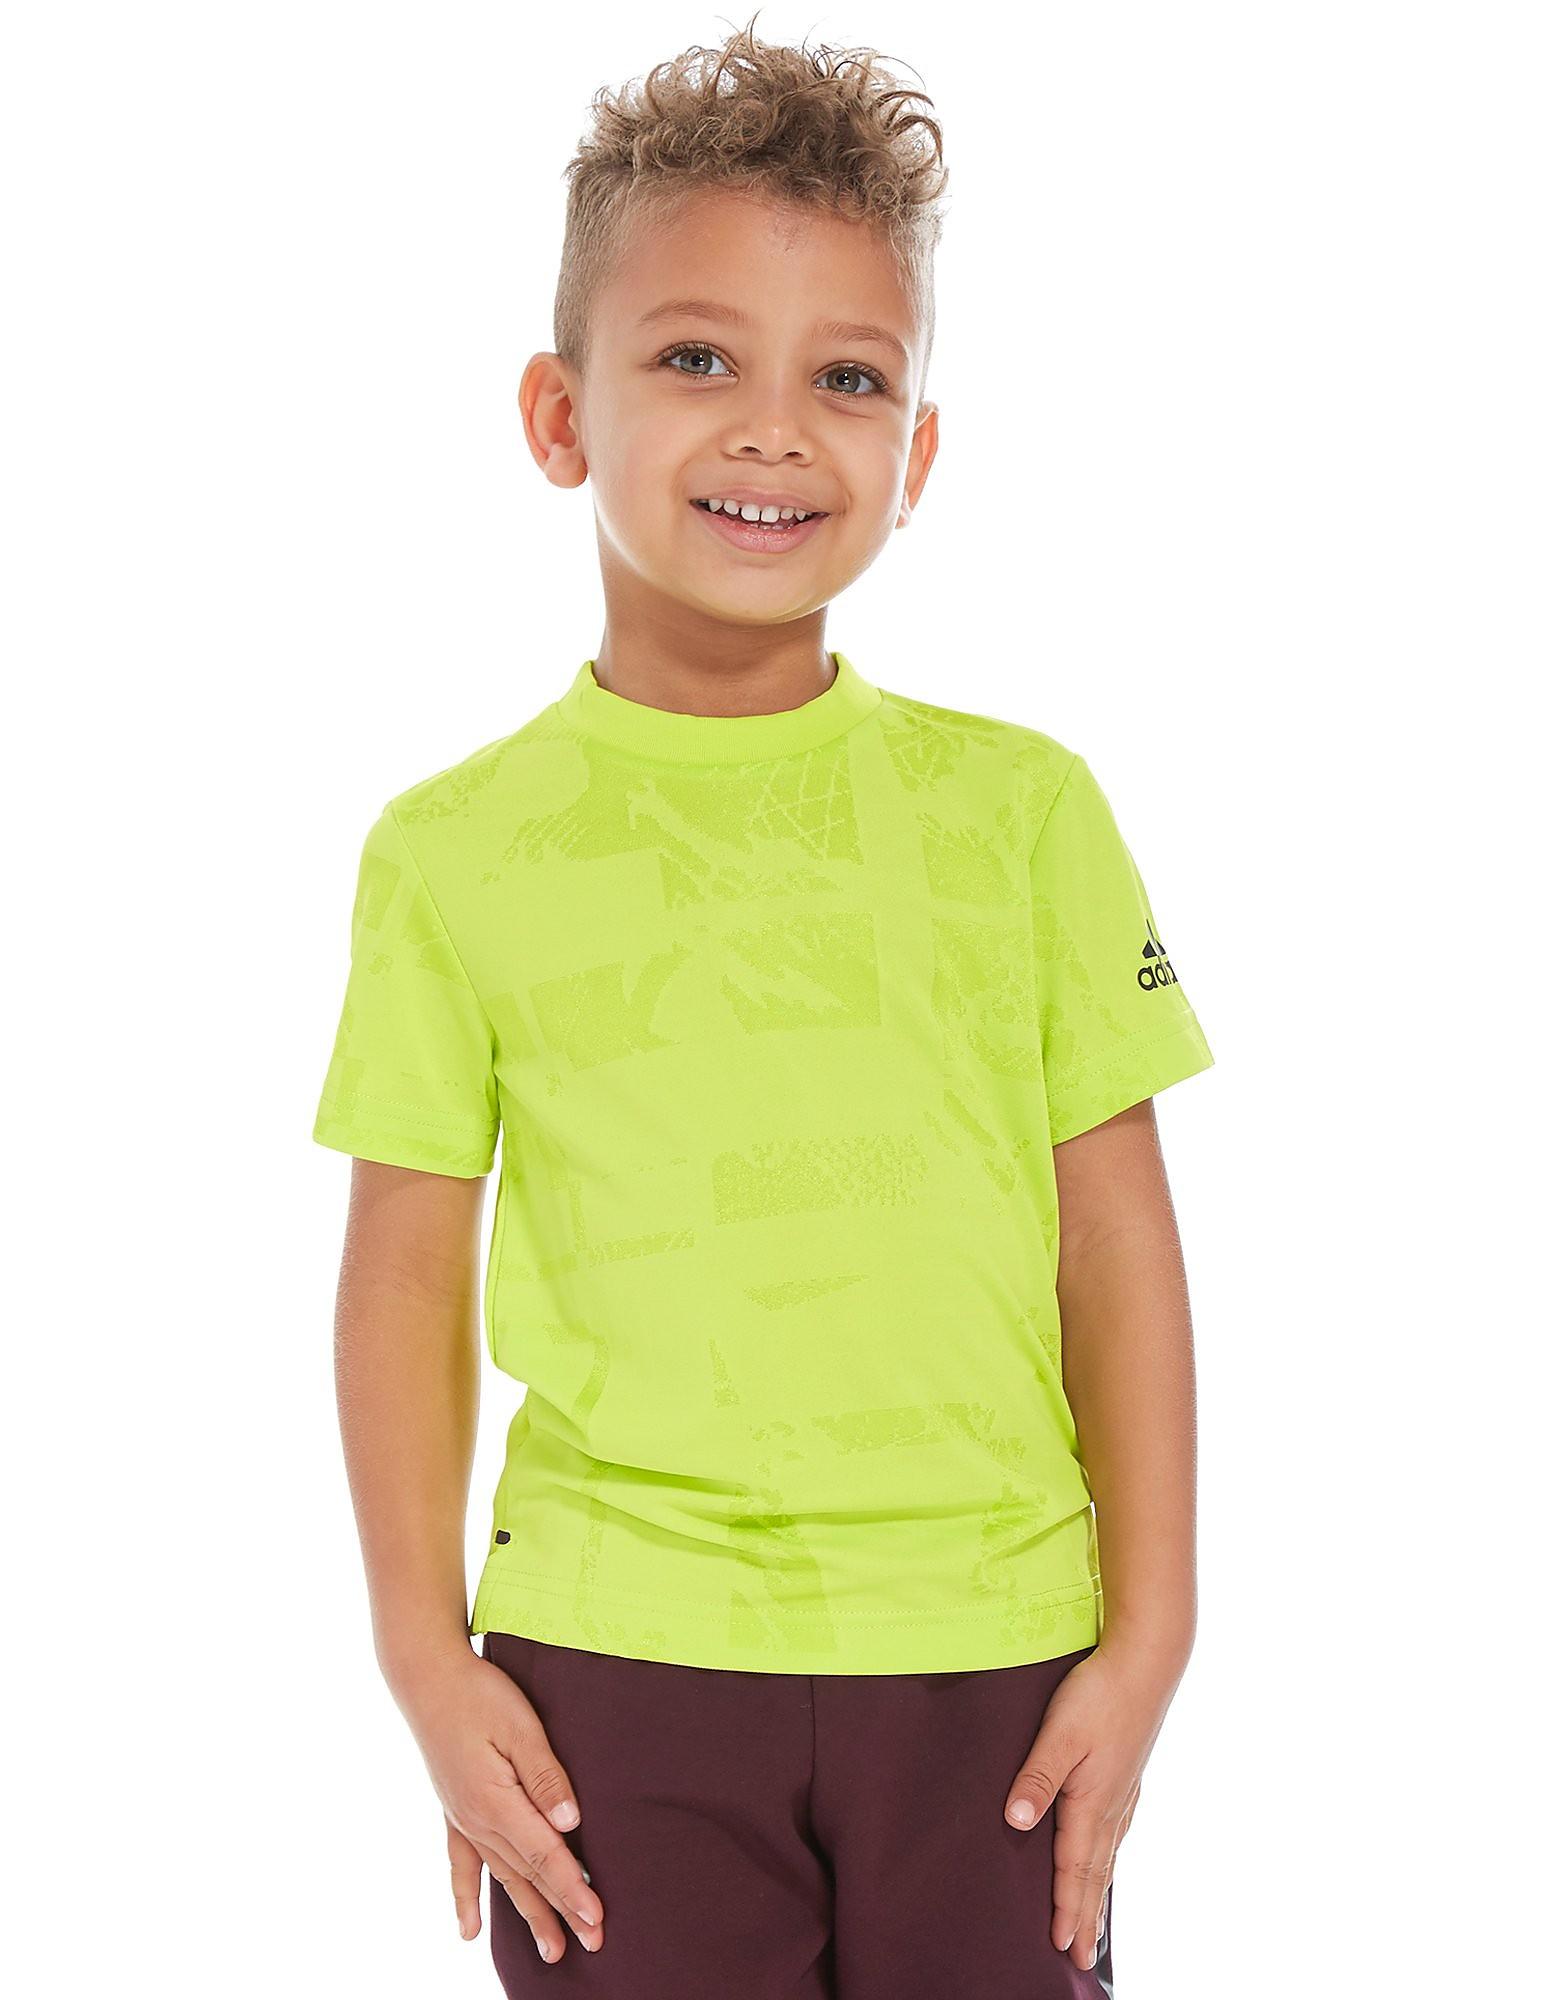 adidas camiseta de entrenamiento Sprint infantil